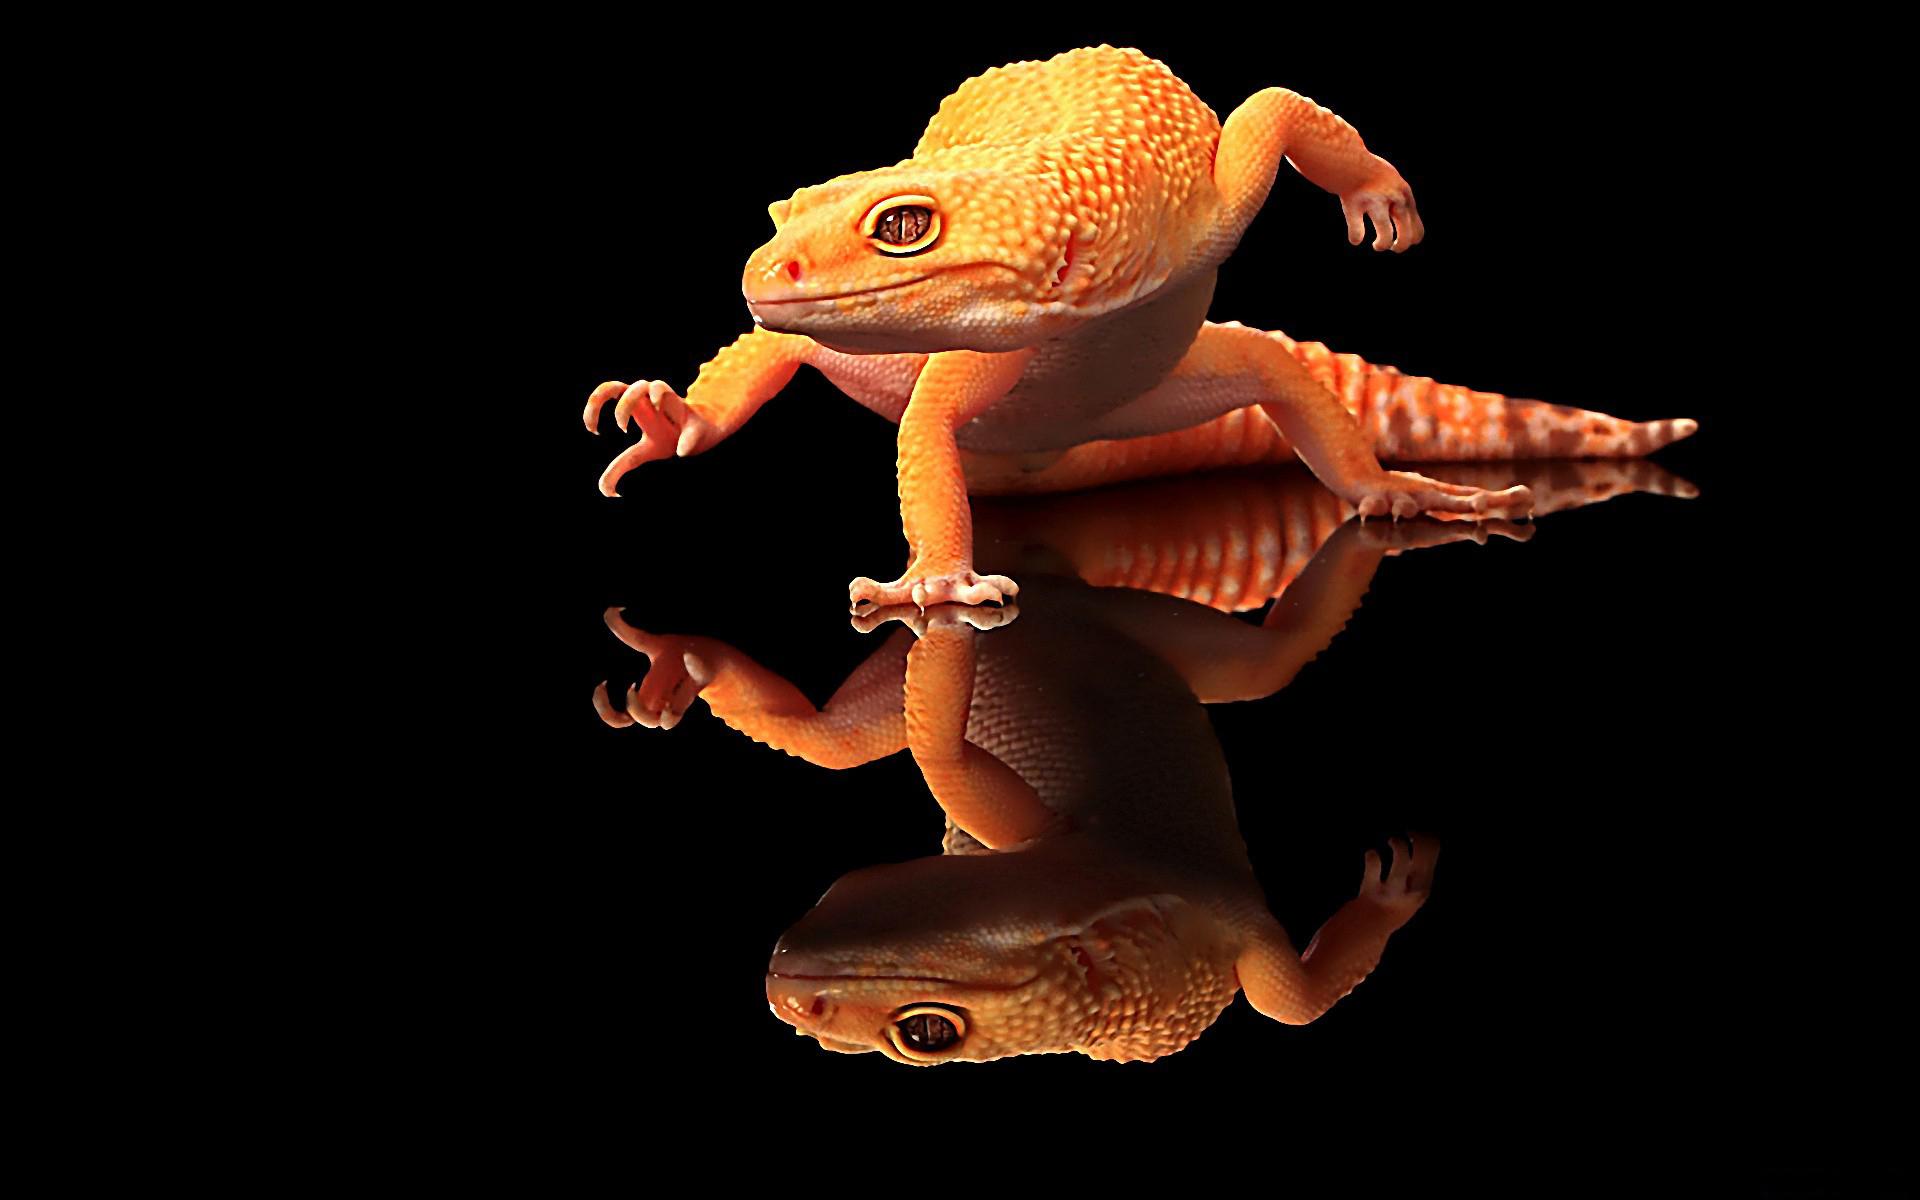 Gecko HD Wallpaper Background Image 1920x1200 ID405014 1920x1200